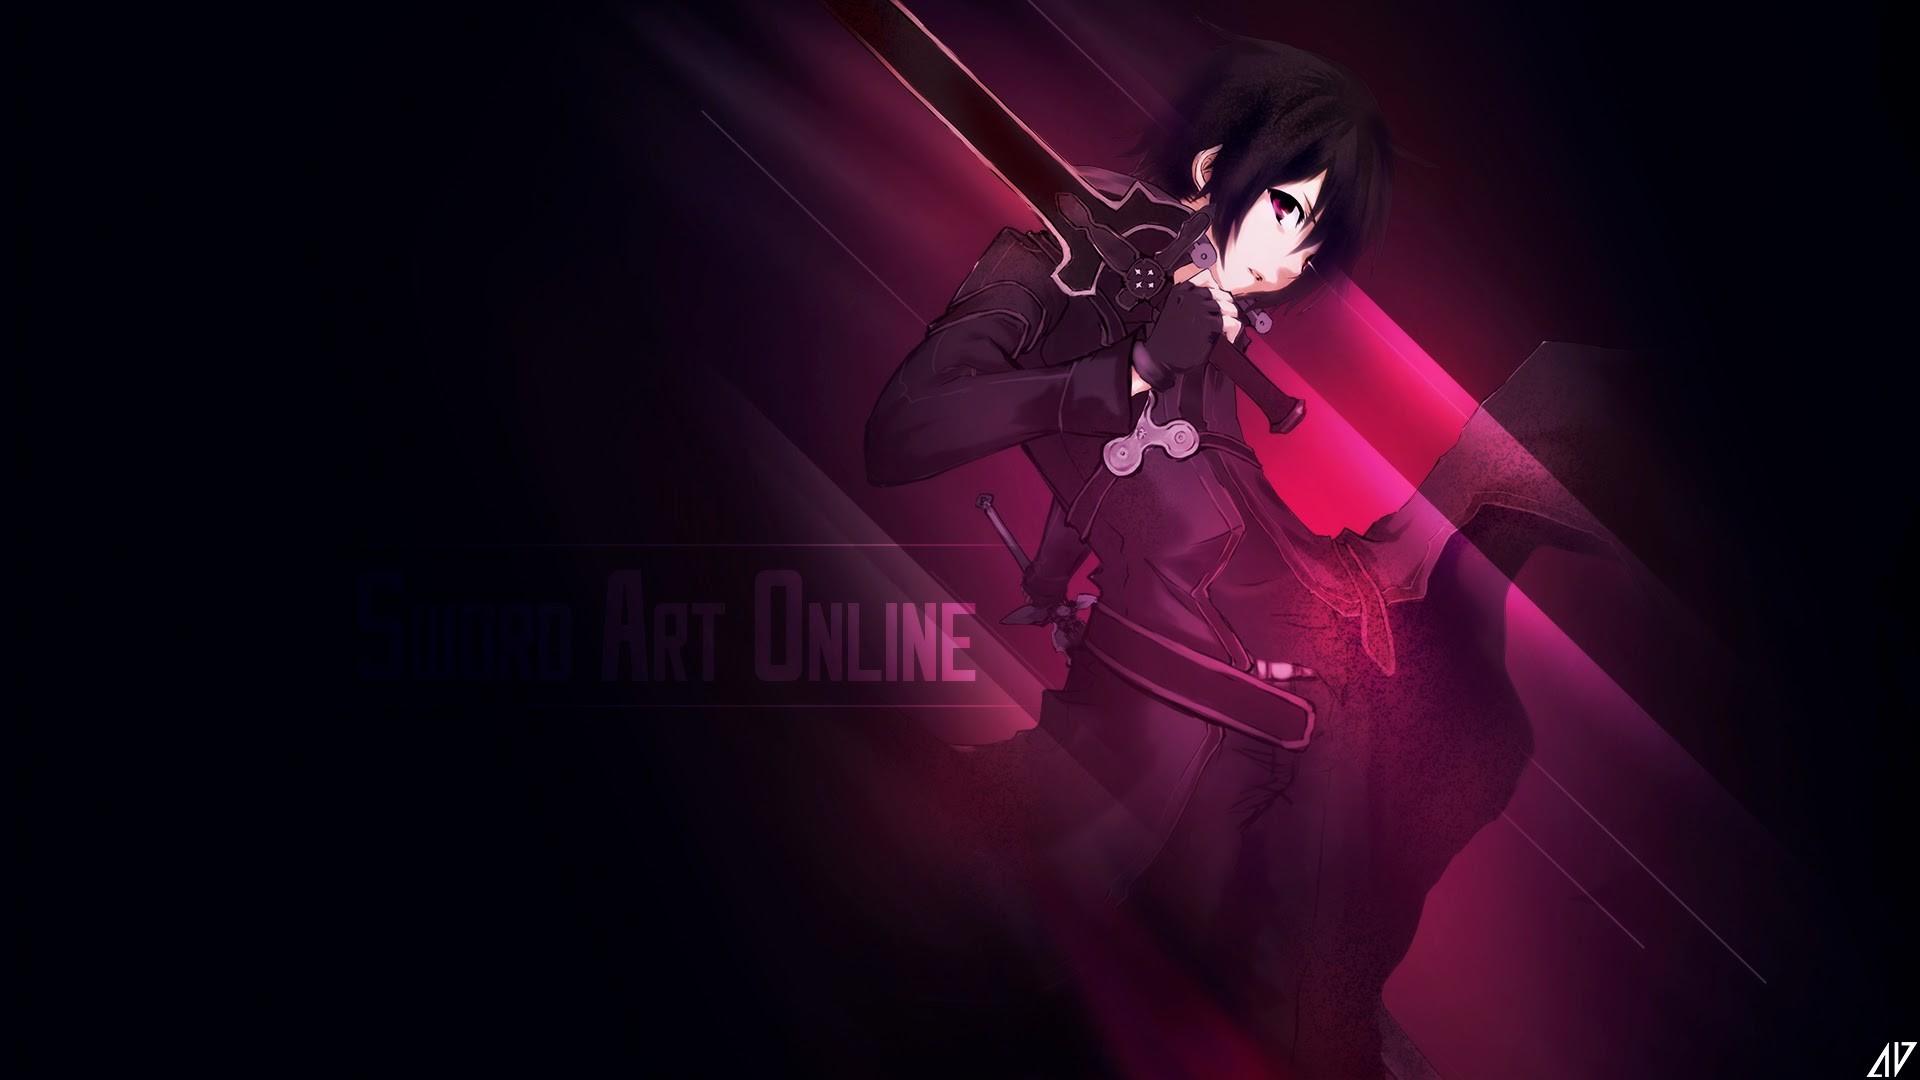 Kirito Anime Picture 0l HD Wallpaper. Anime & Manga + Sword Art Online